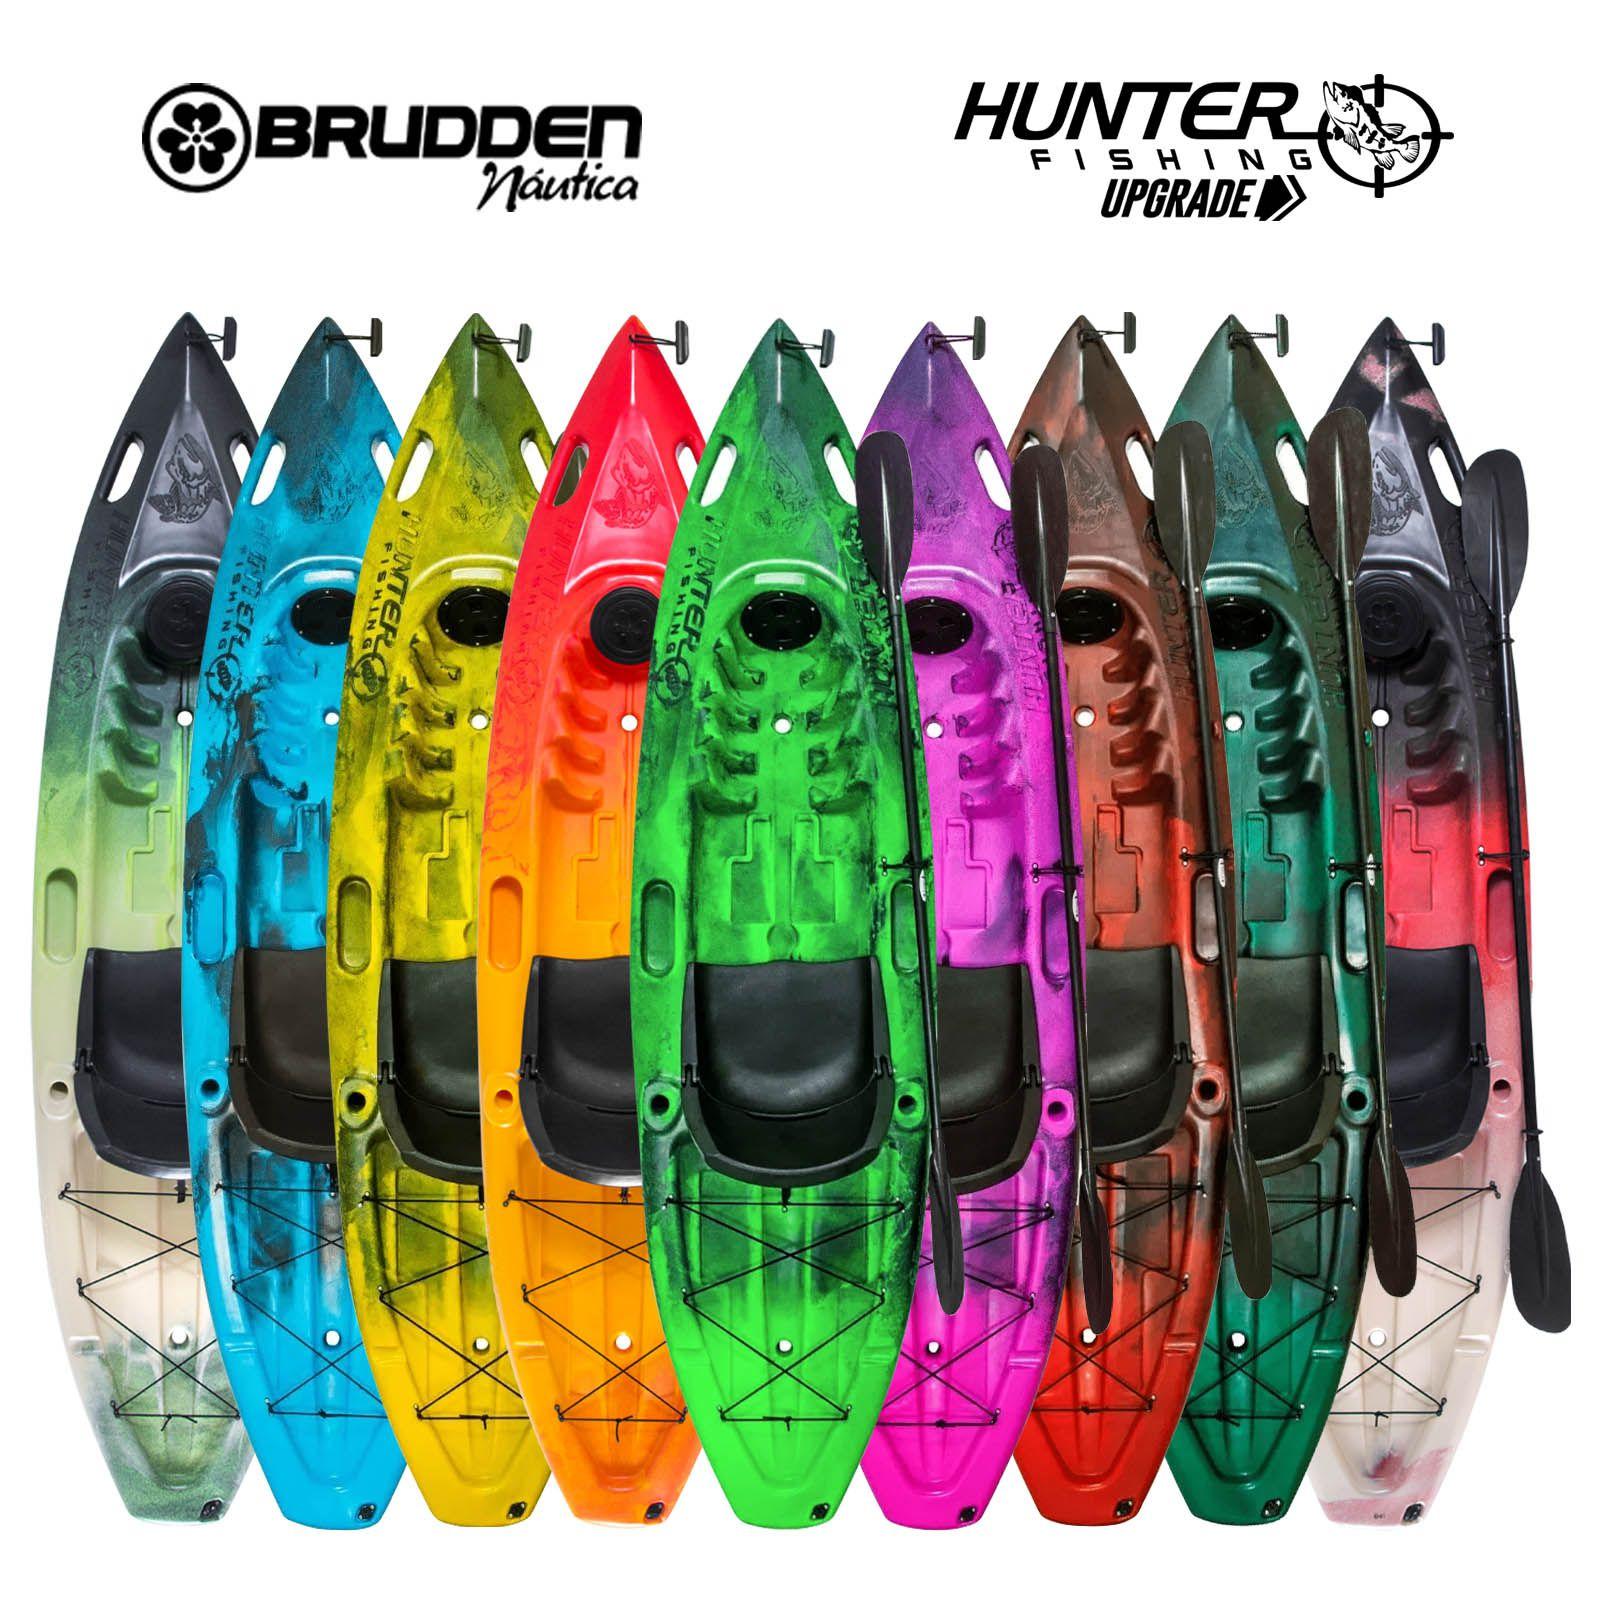 b724abfdc Caiaque Brudden Náutica Hunter Fishing Up - Fantin Store - Loja de ...